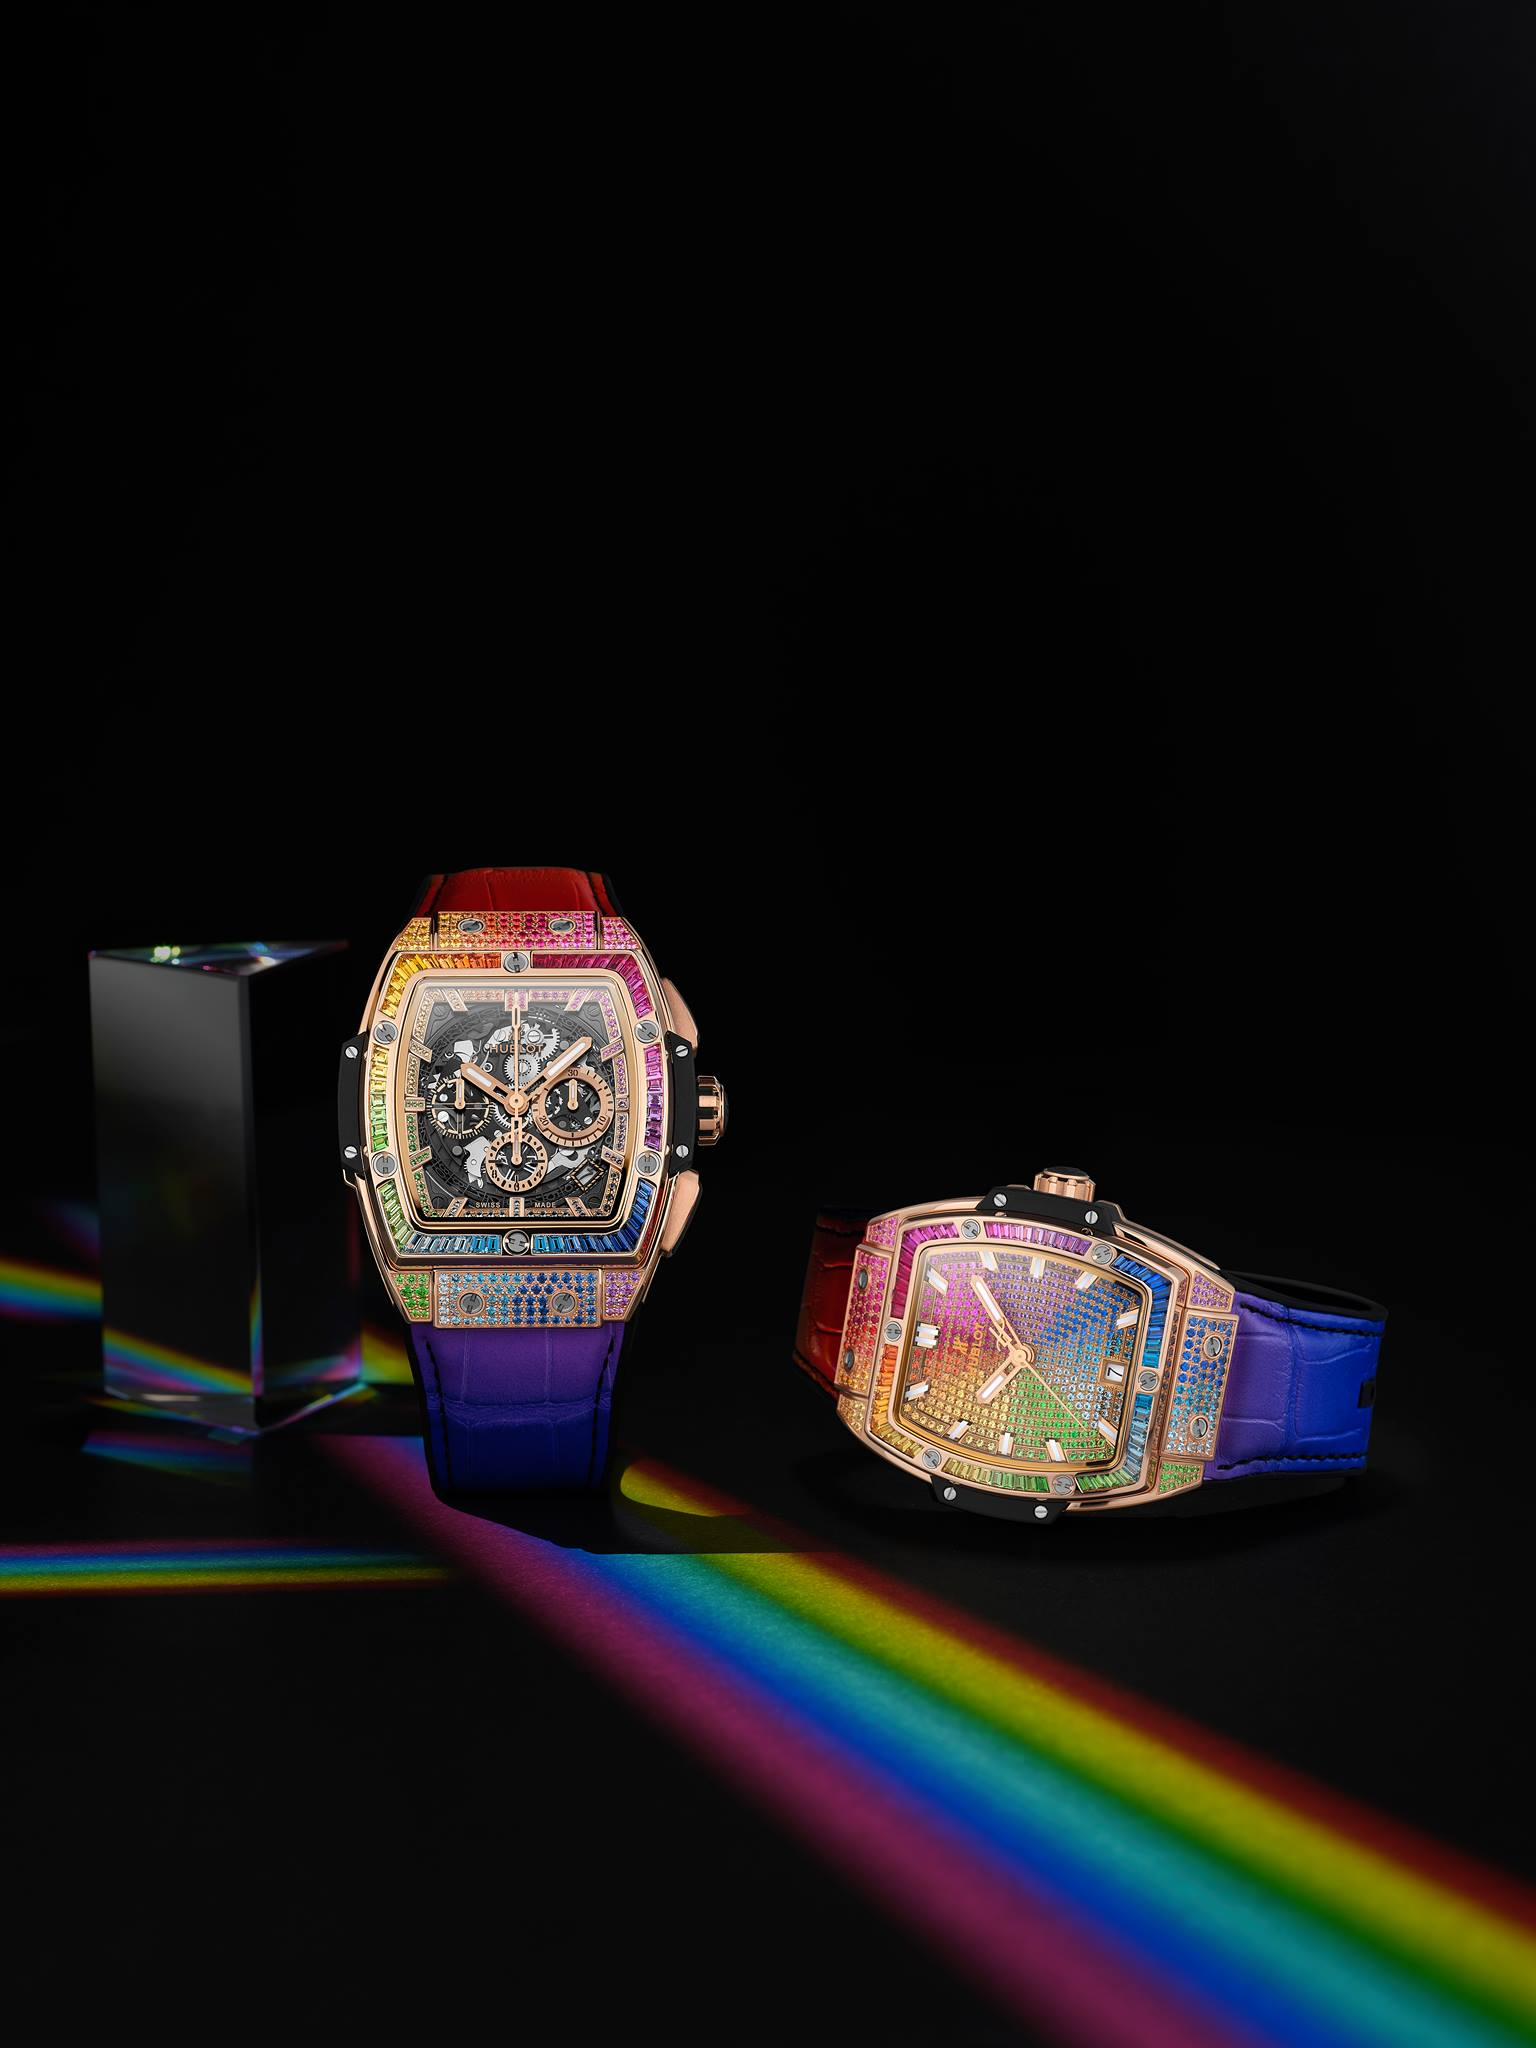 Hublot Dubai Watch Week 2020 - Spirit of Big Bang Rainbow